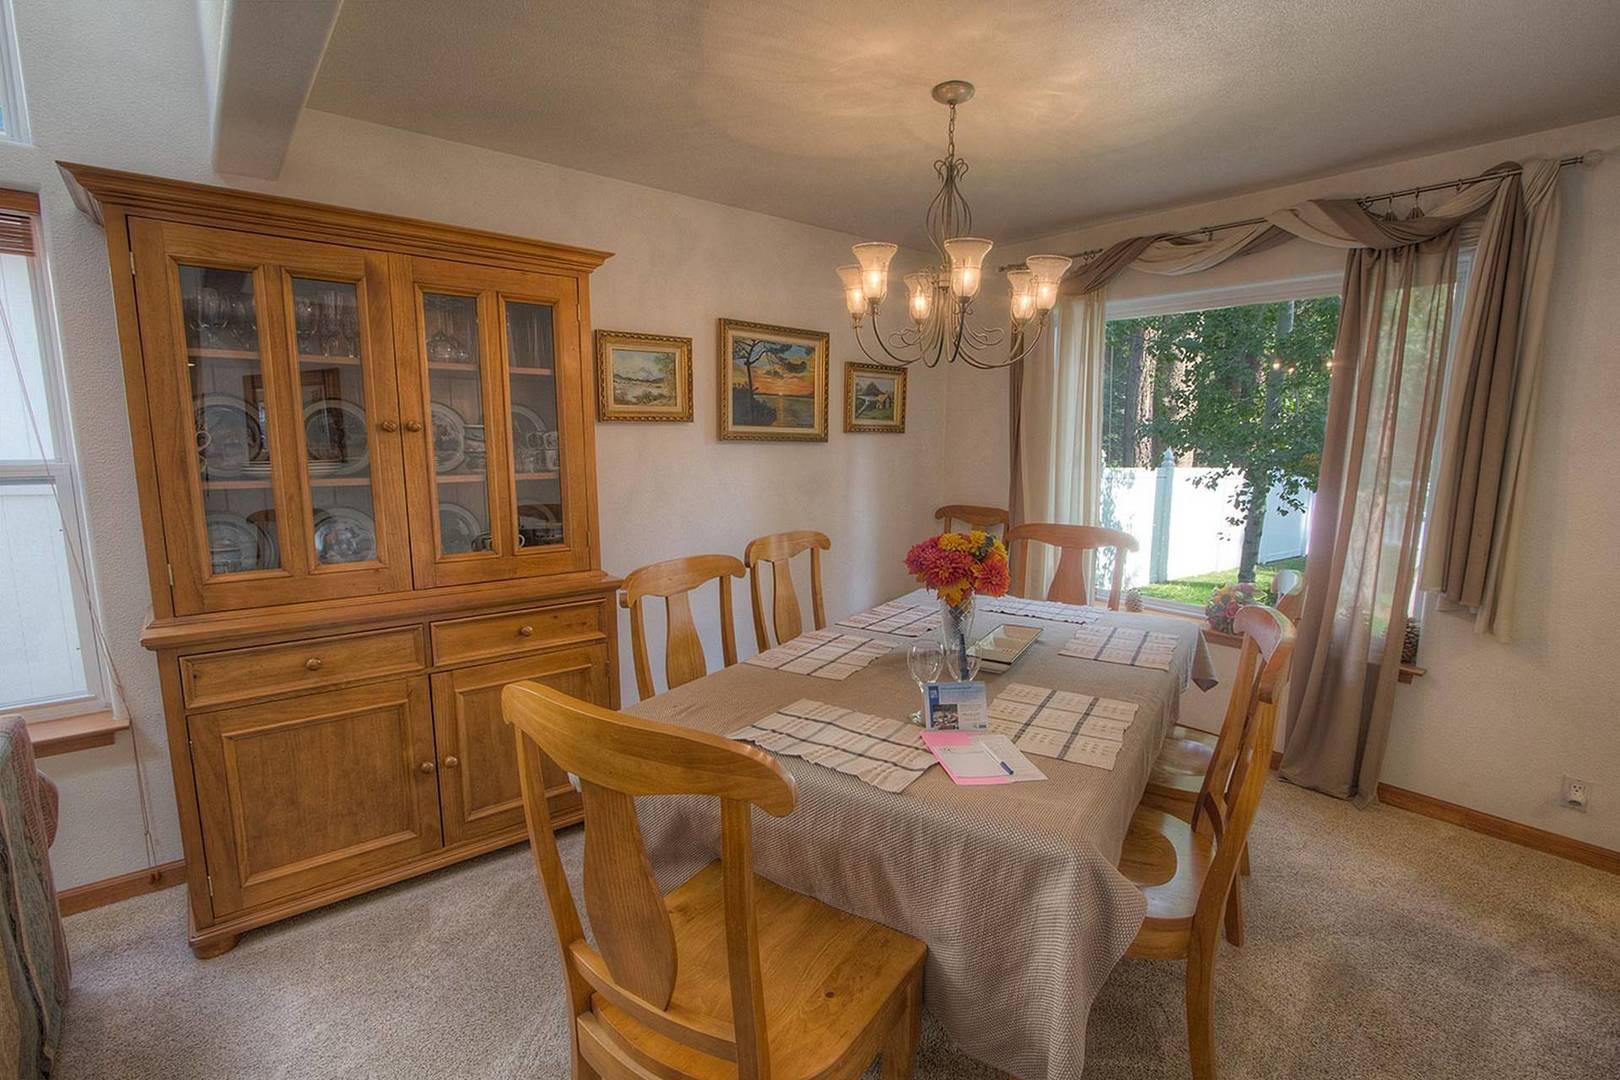 cyh1077 dining room